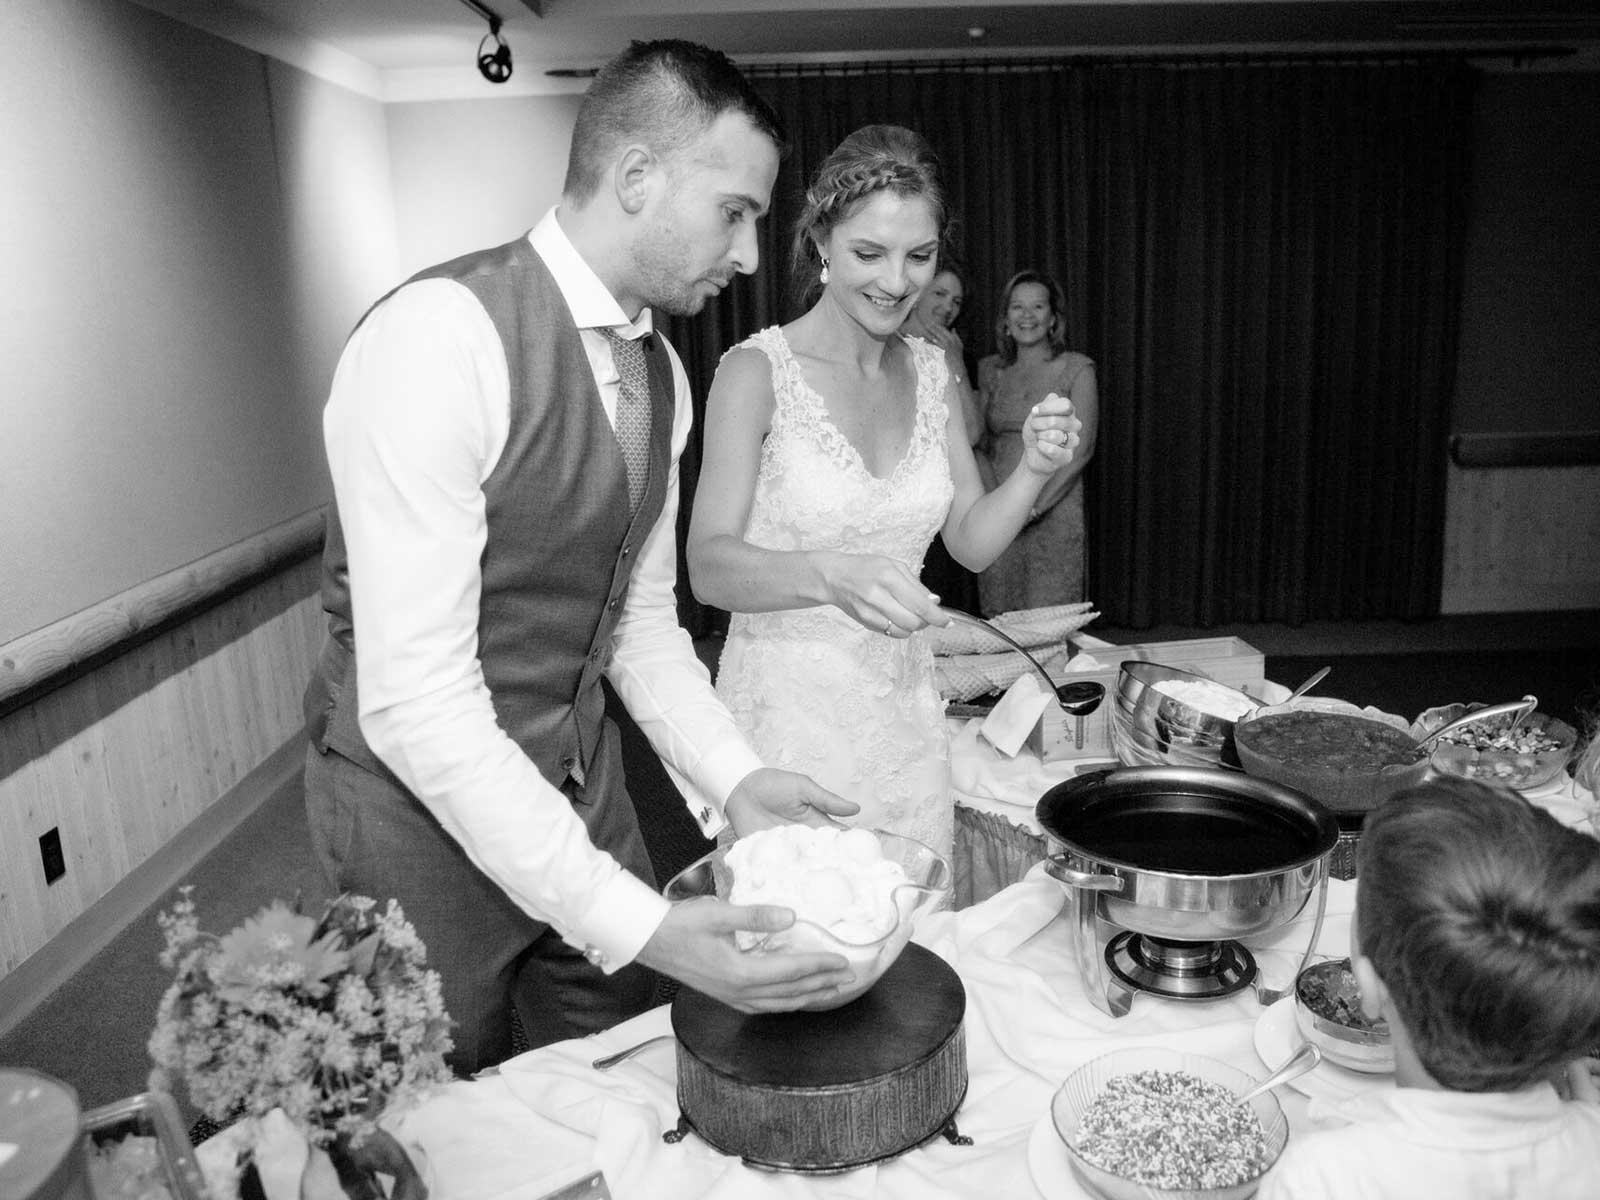 Mandy and Chris serving dessert